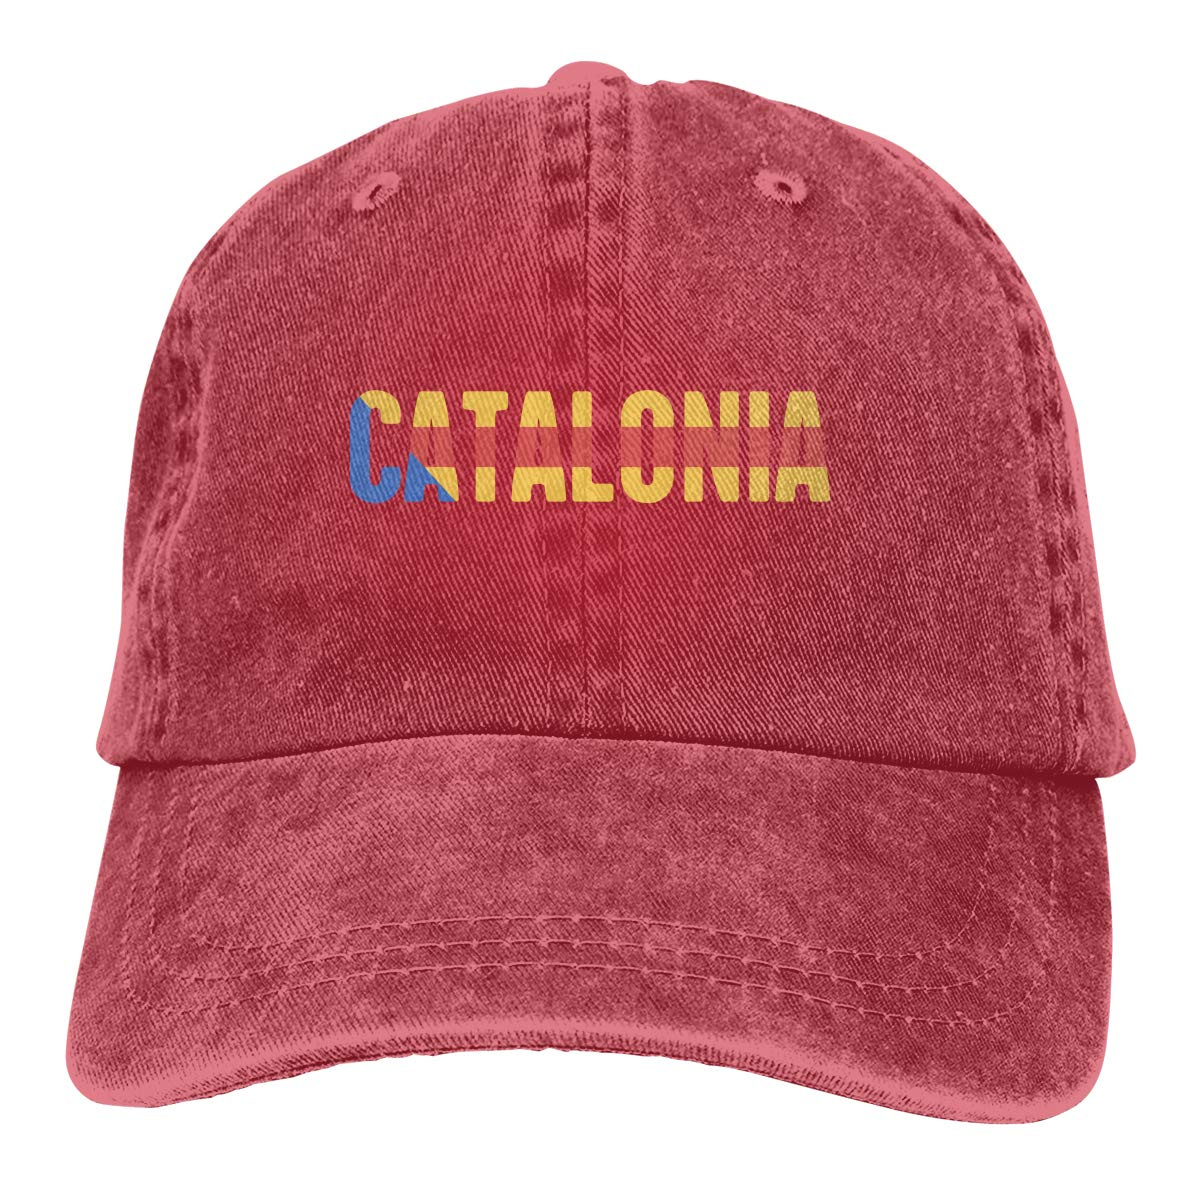 PMGM-C Catalonia Unisex Personalize Cowboy Casquette Adjustable Baseball Cap